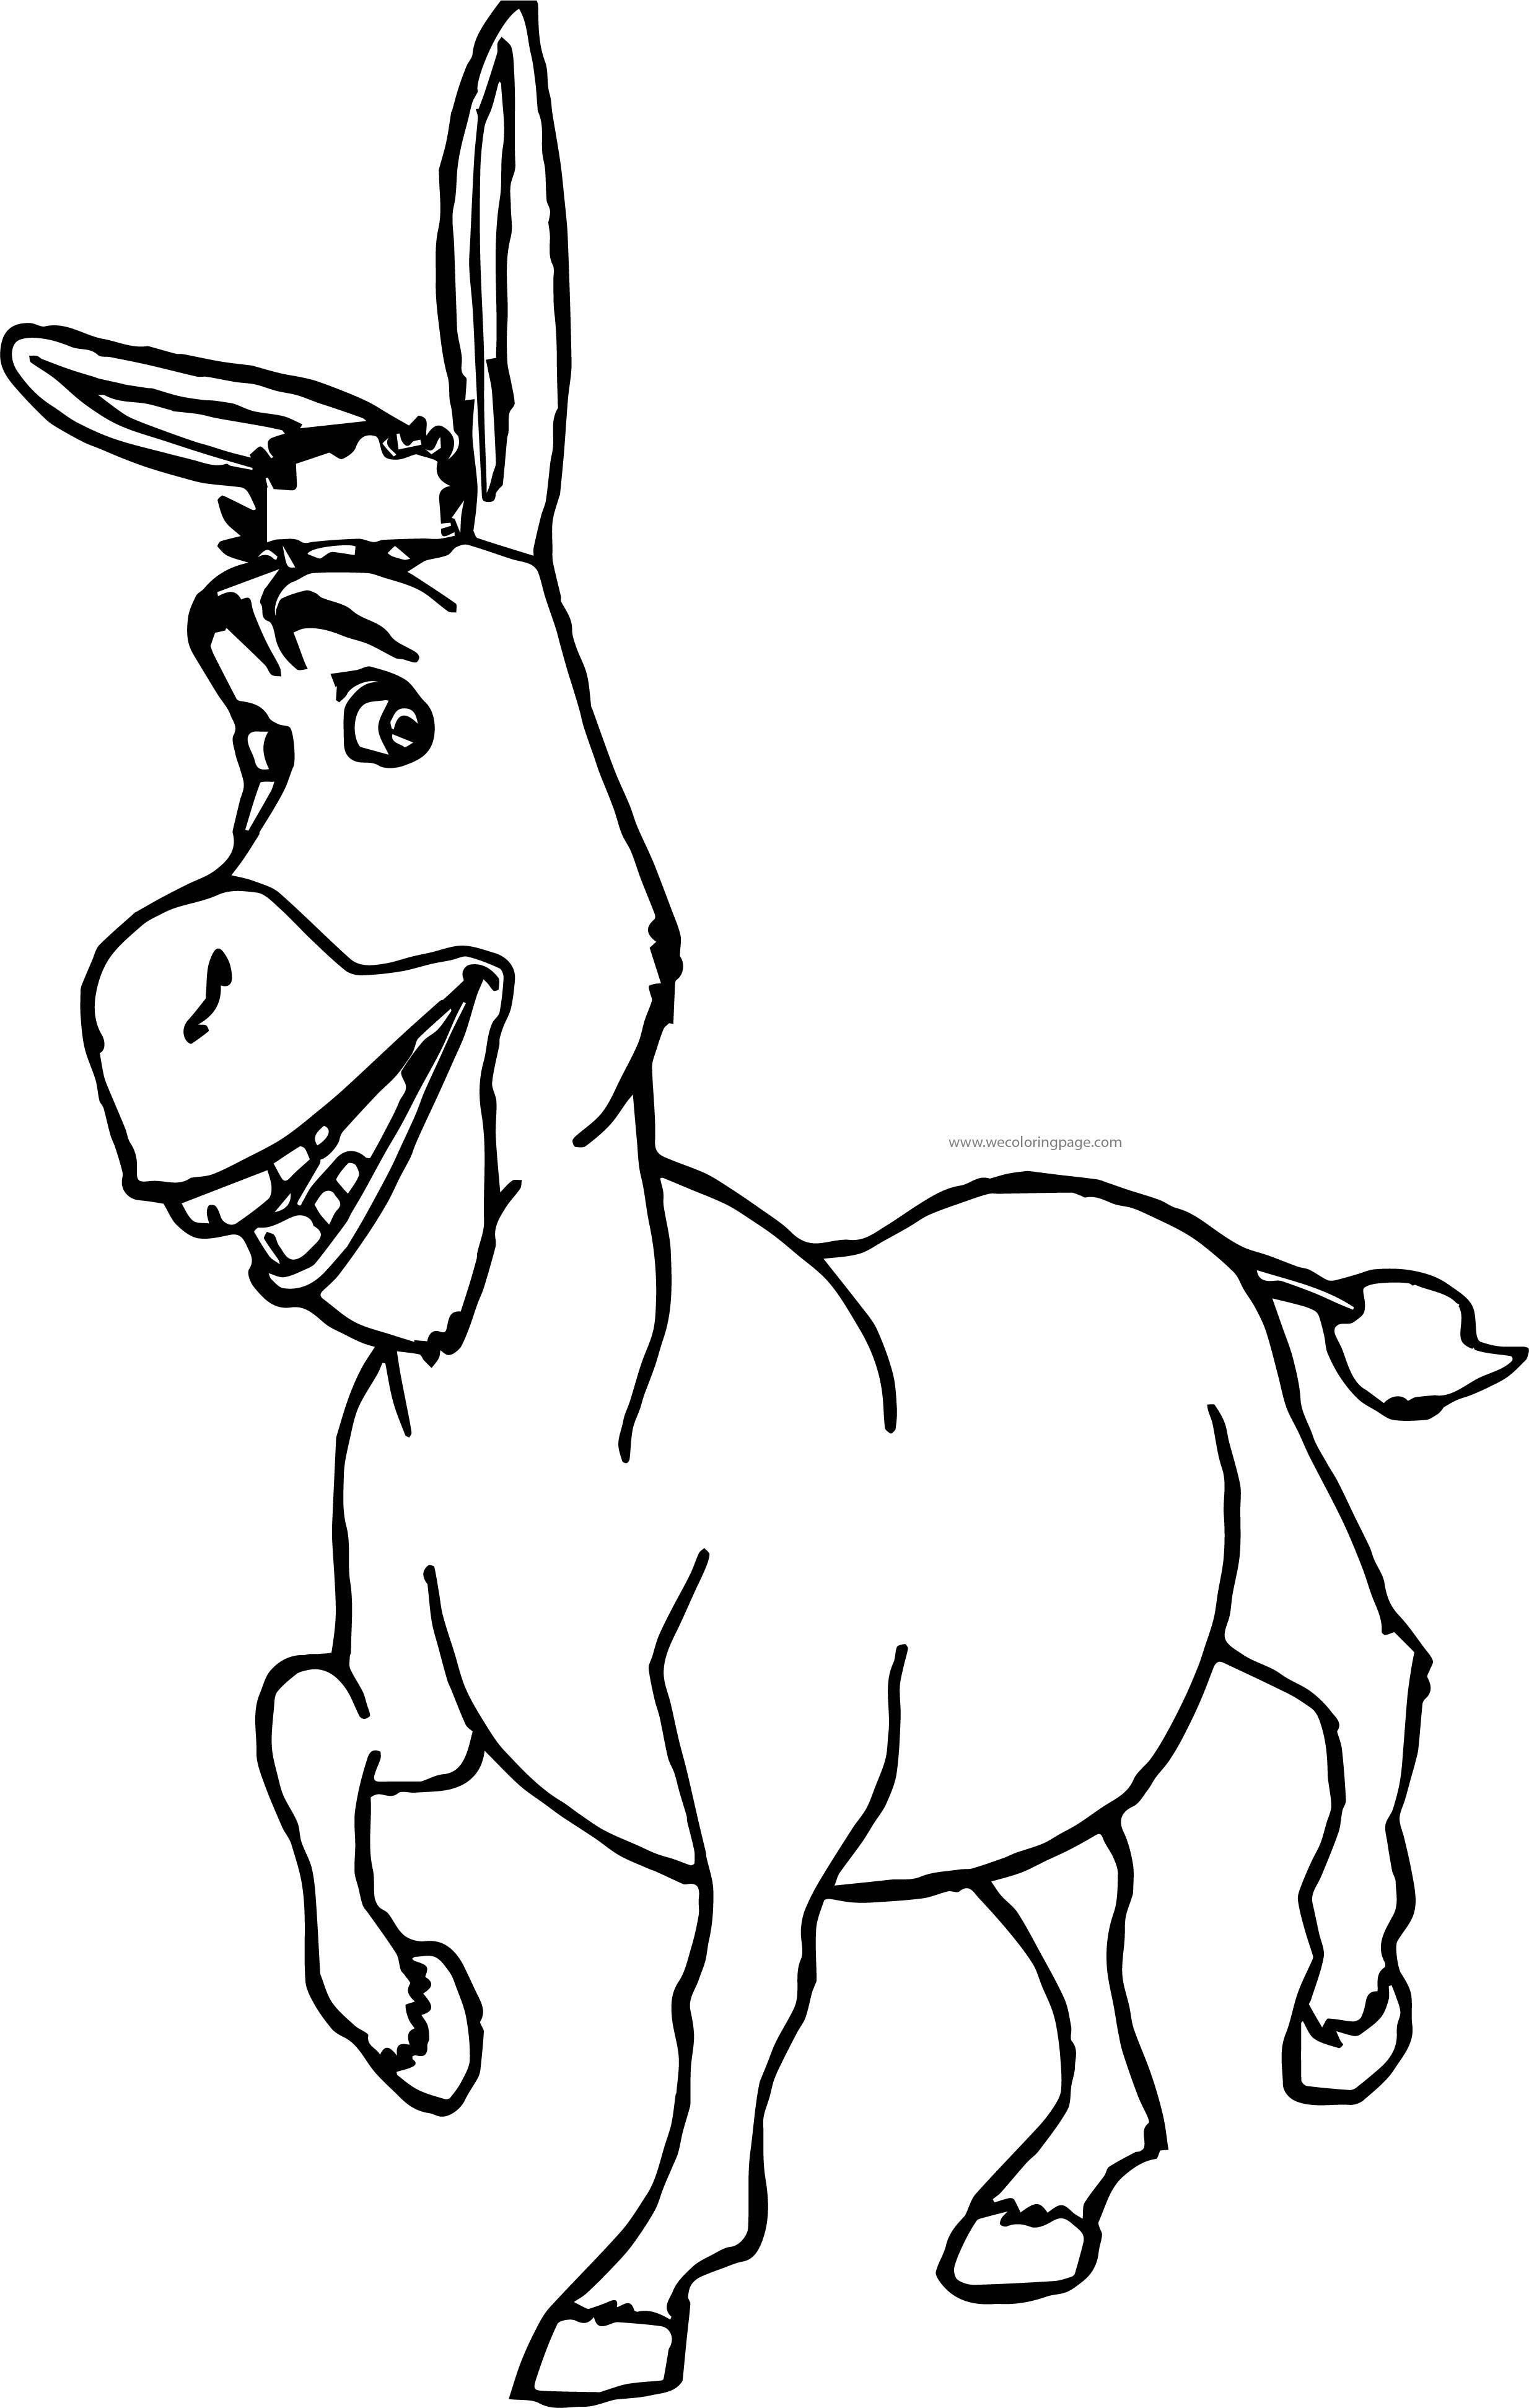 Shrek Donkey Waiting Coloring Page